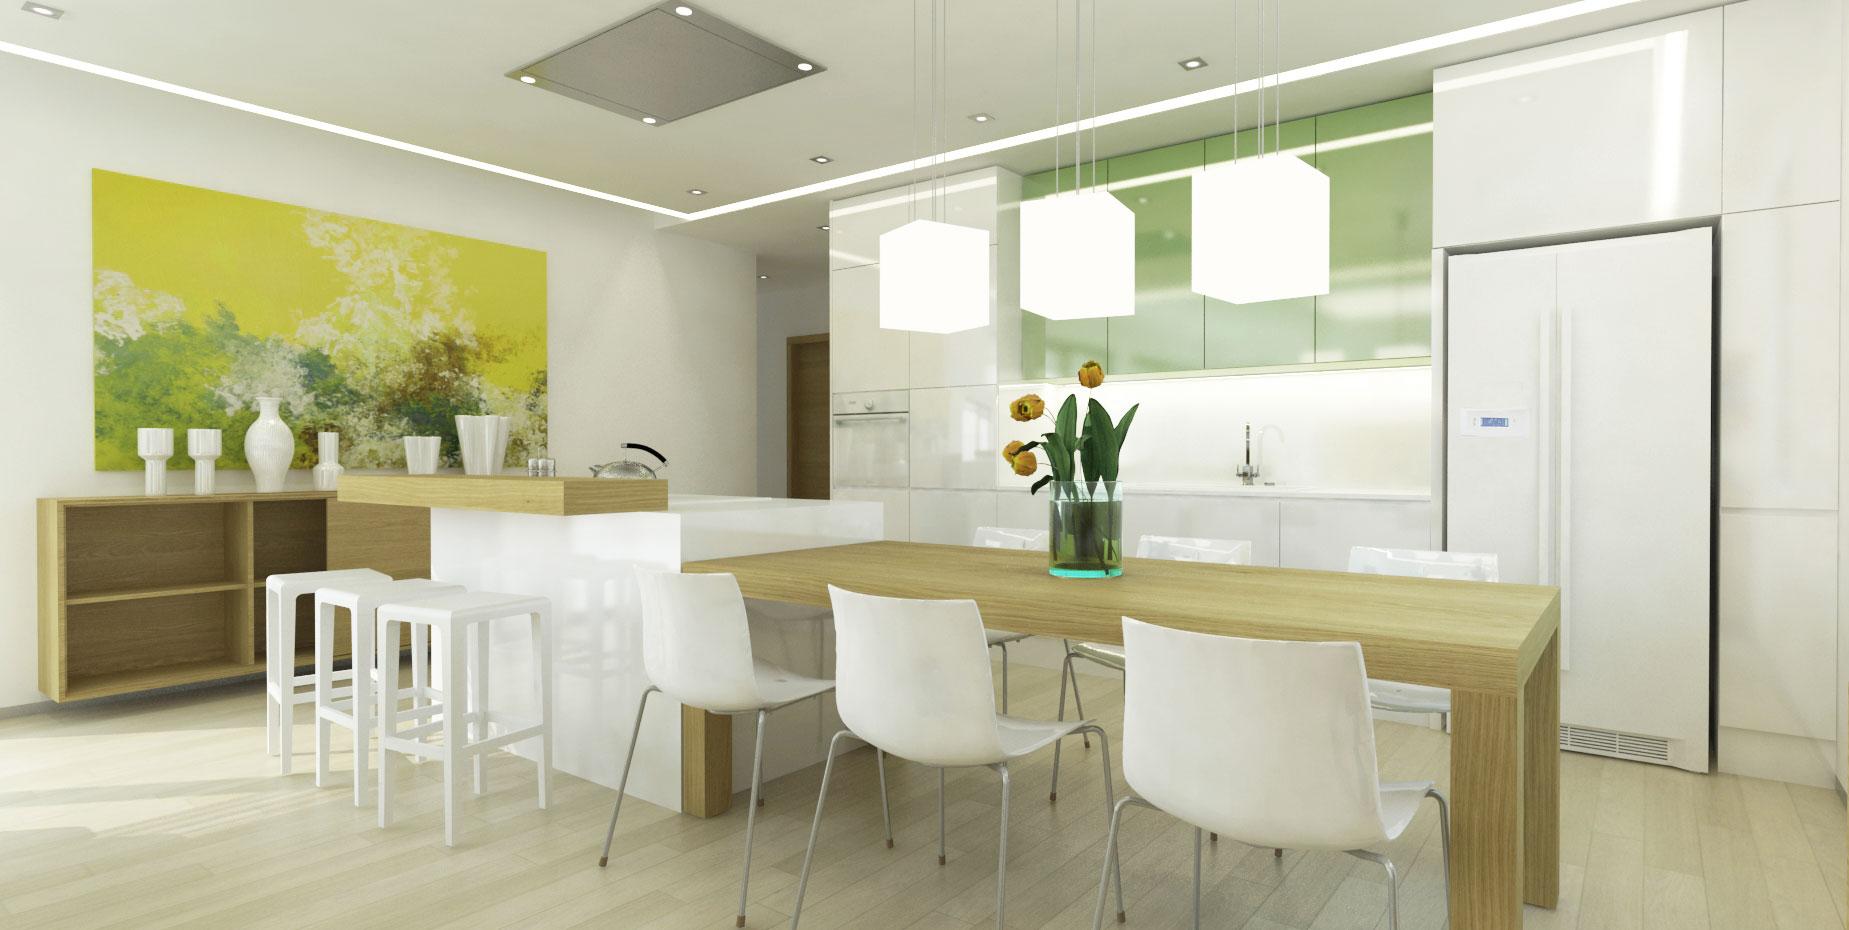 návrh interiéru rodinného domu - kuchyňa